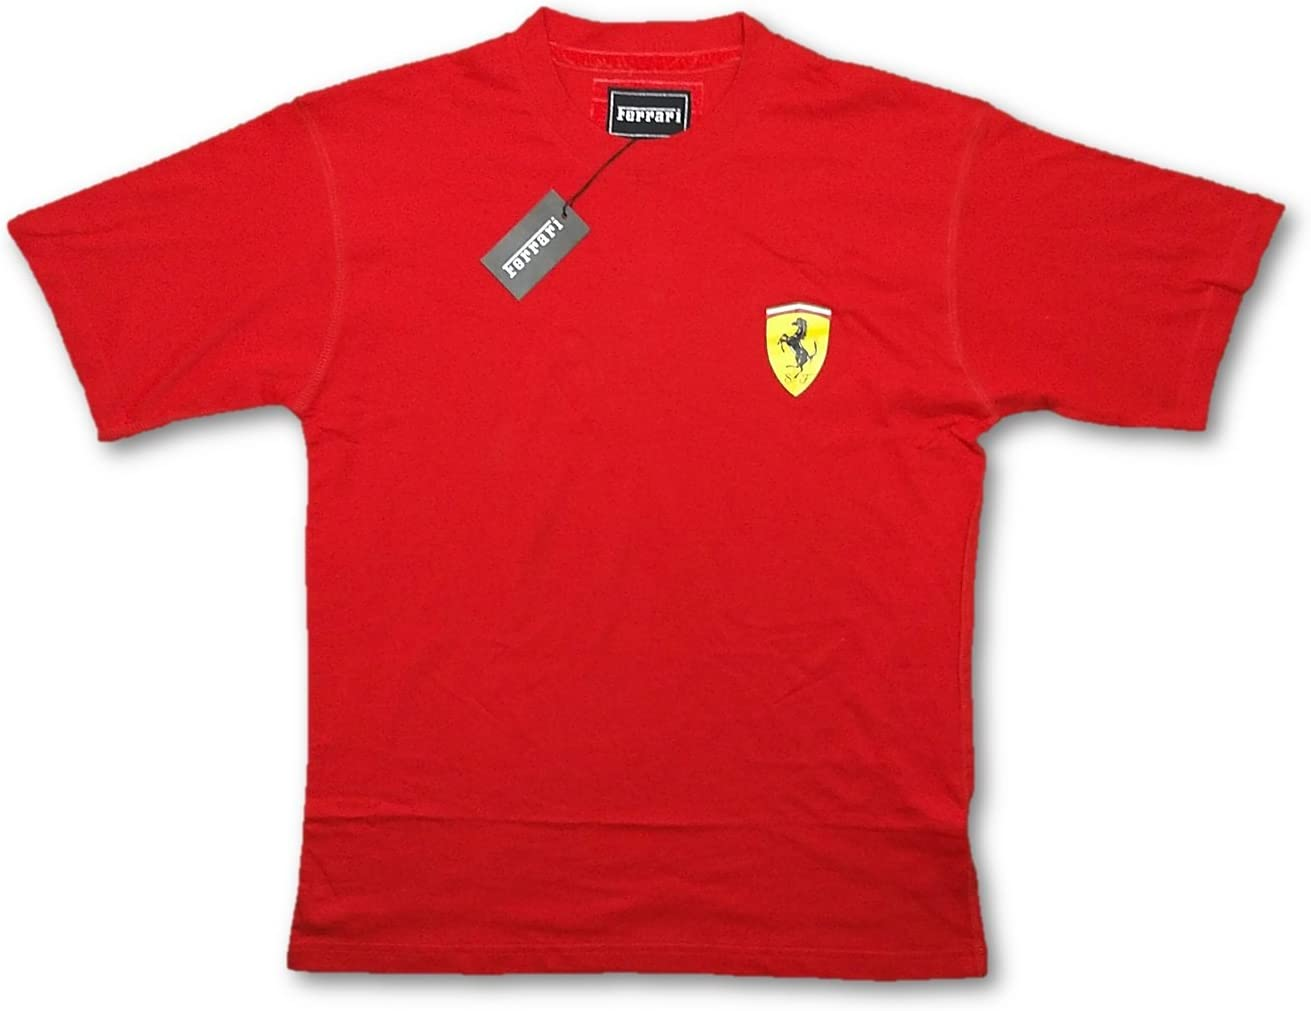 Camiseta fórmula 1 Ferrari F1 Team Scudetto R19, hombre, rojo, xx ...